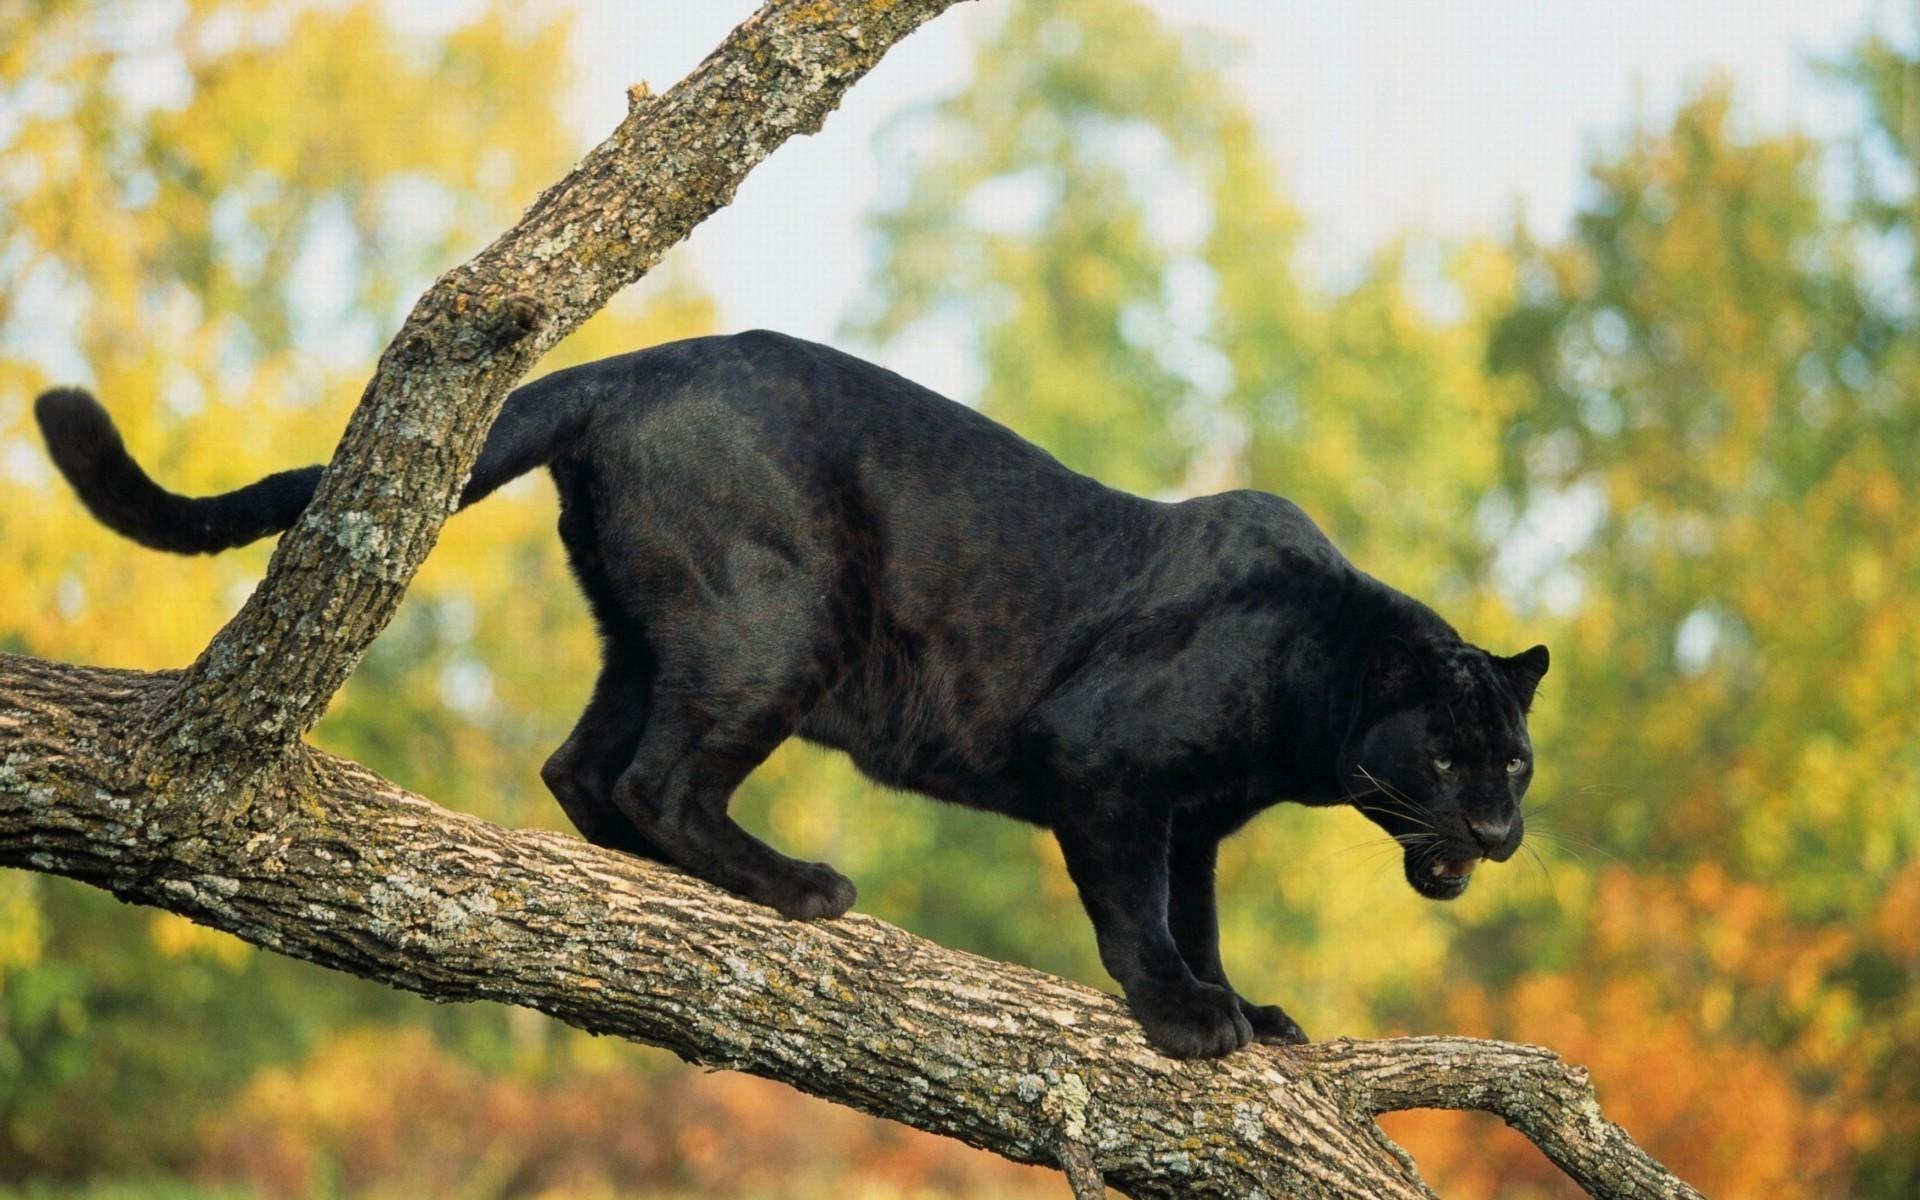 Image: Panther, cat, predator, leopard, tree, trunk, branch, black color